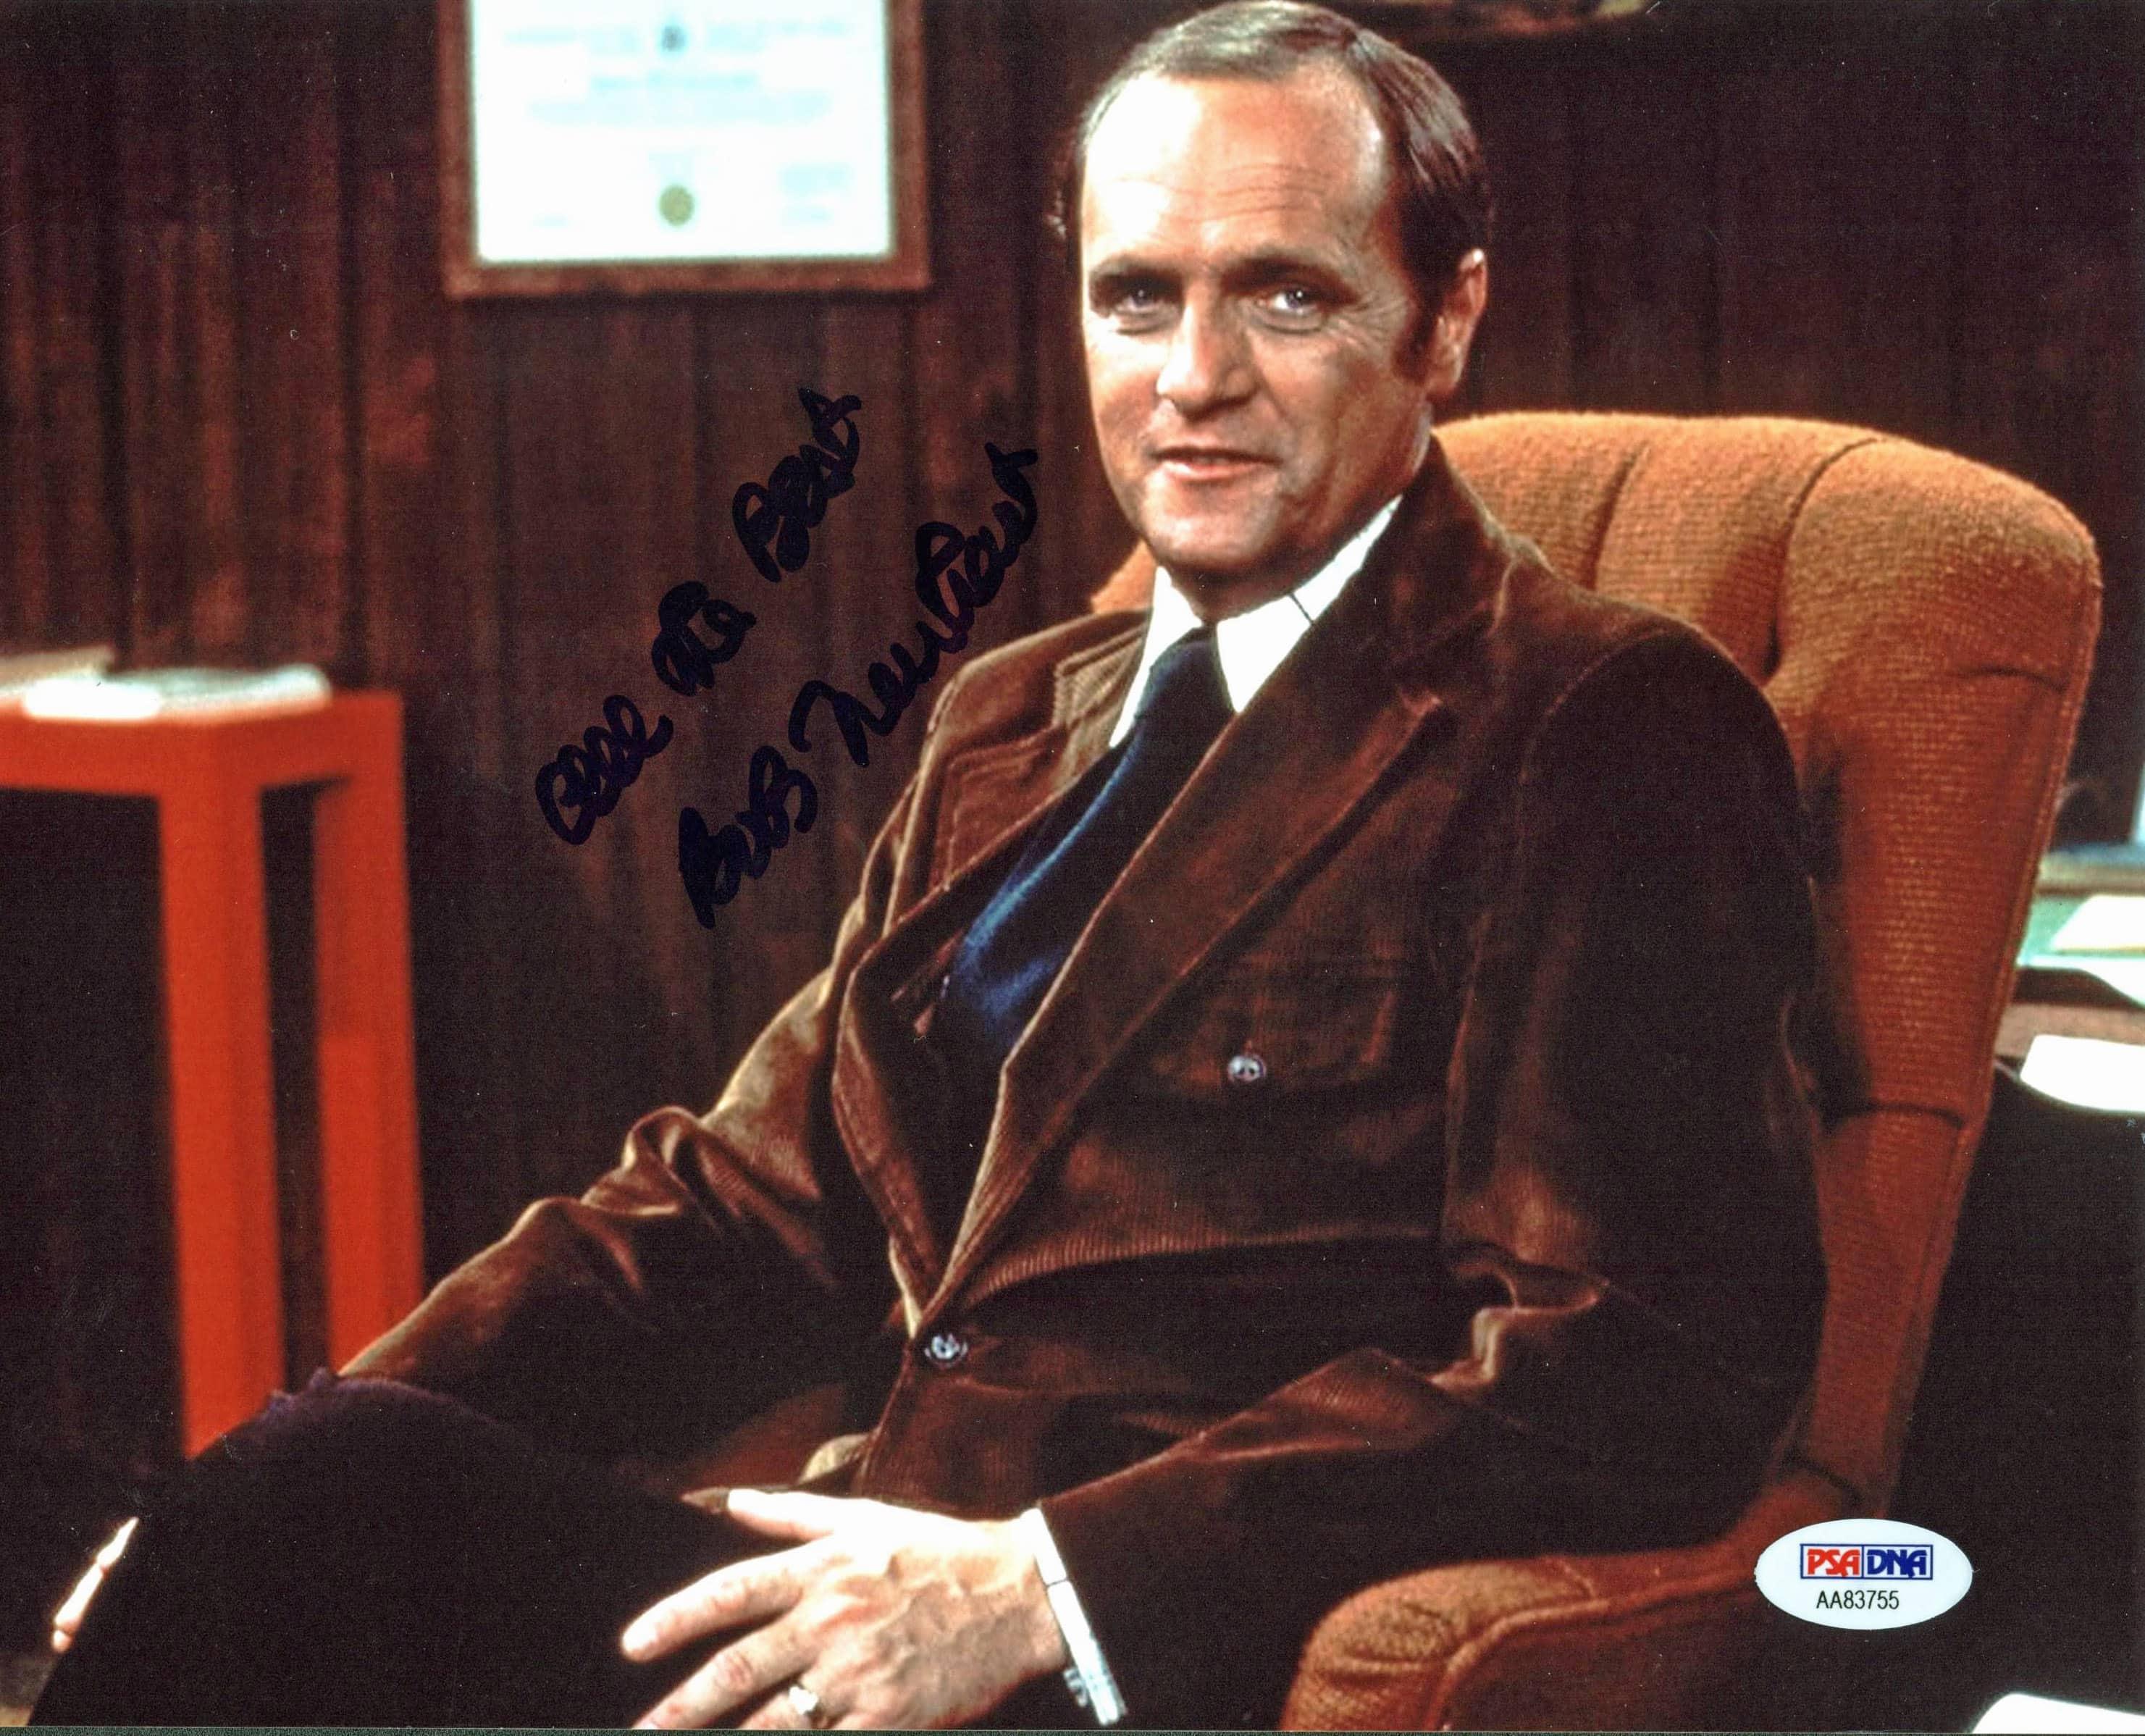 Bob Newhart The Bob Newhart Show Authentic Signed 8x10 Photo PSA/DNA #AA83755